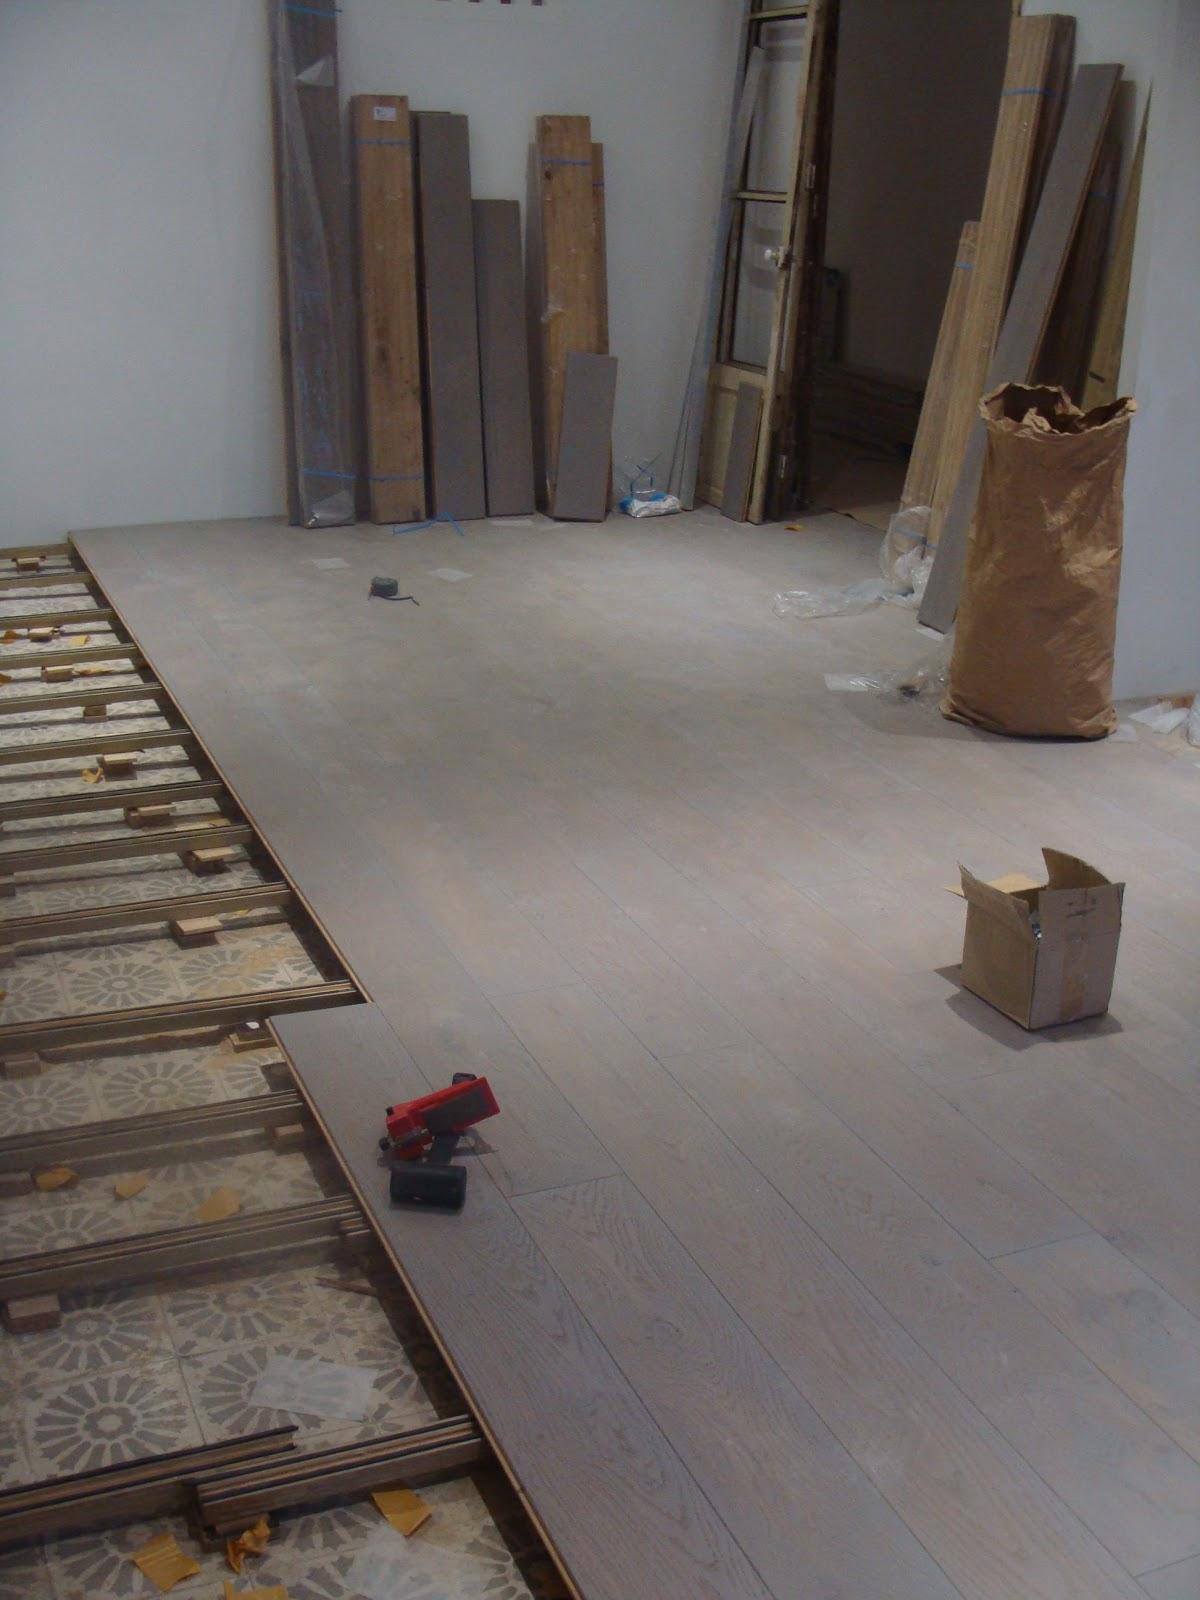 Andocarpinteando tarima natural en barcelona soluci n - Rellenar juntas piso madera ...